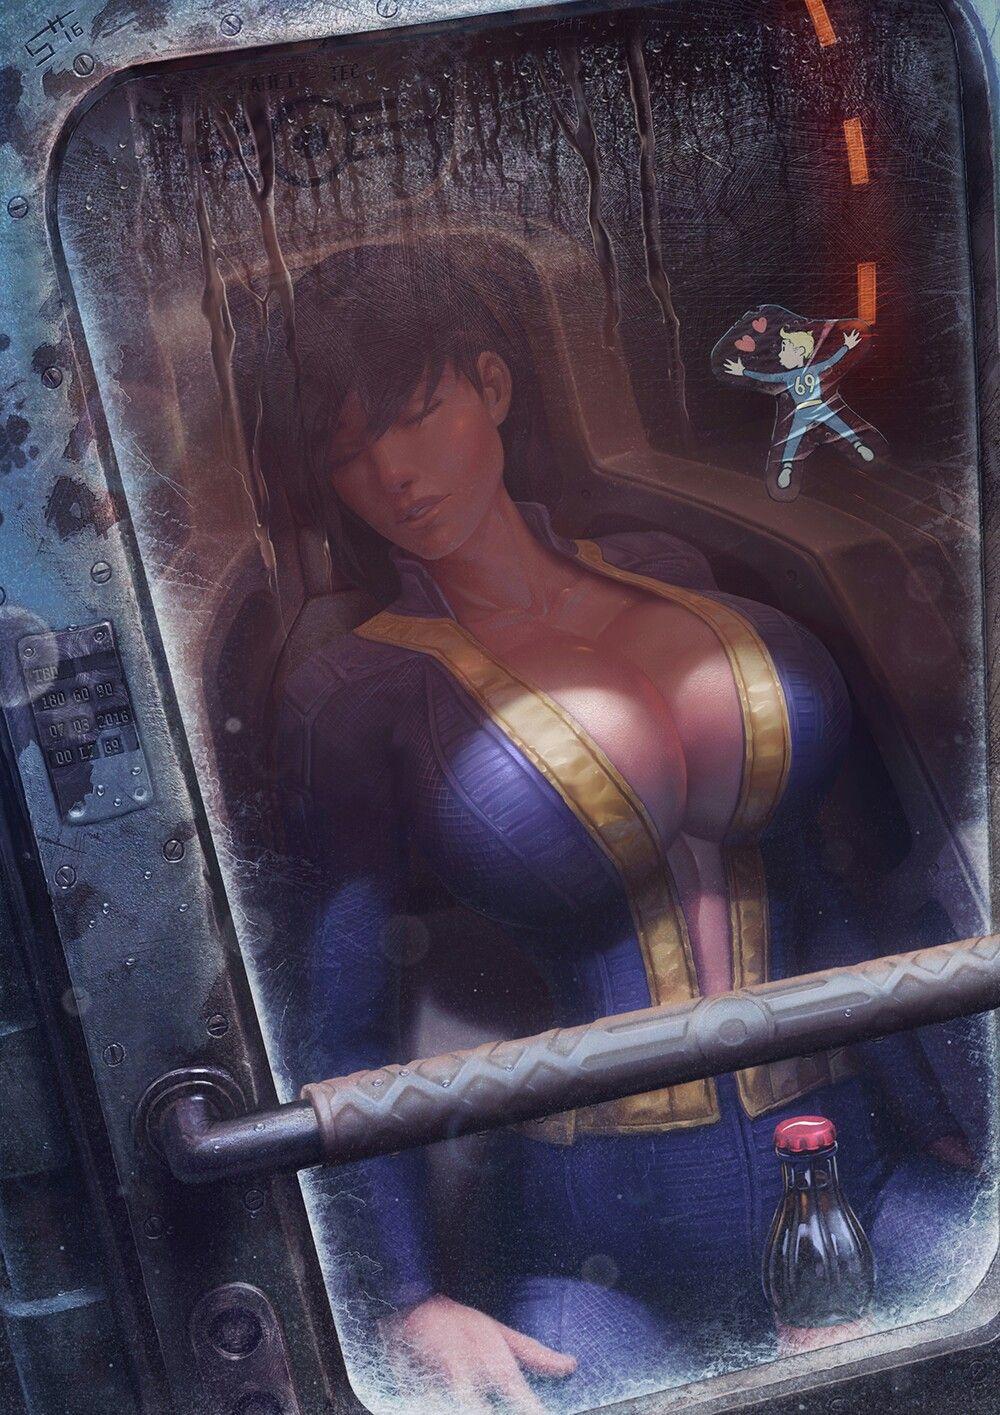 Anime Porn Comics Fallout atomic beauty fallout 4 mod on nexus | fallout art, fallout